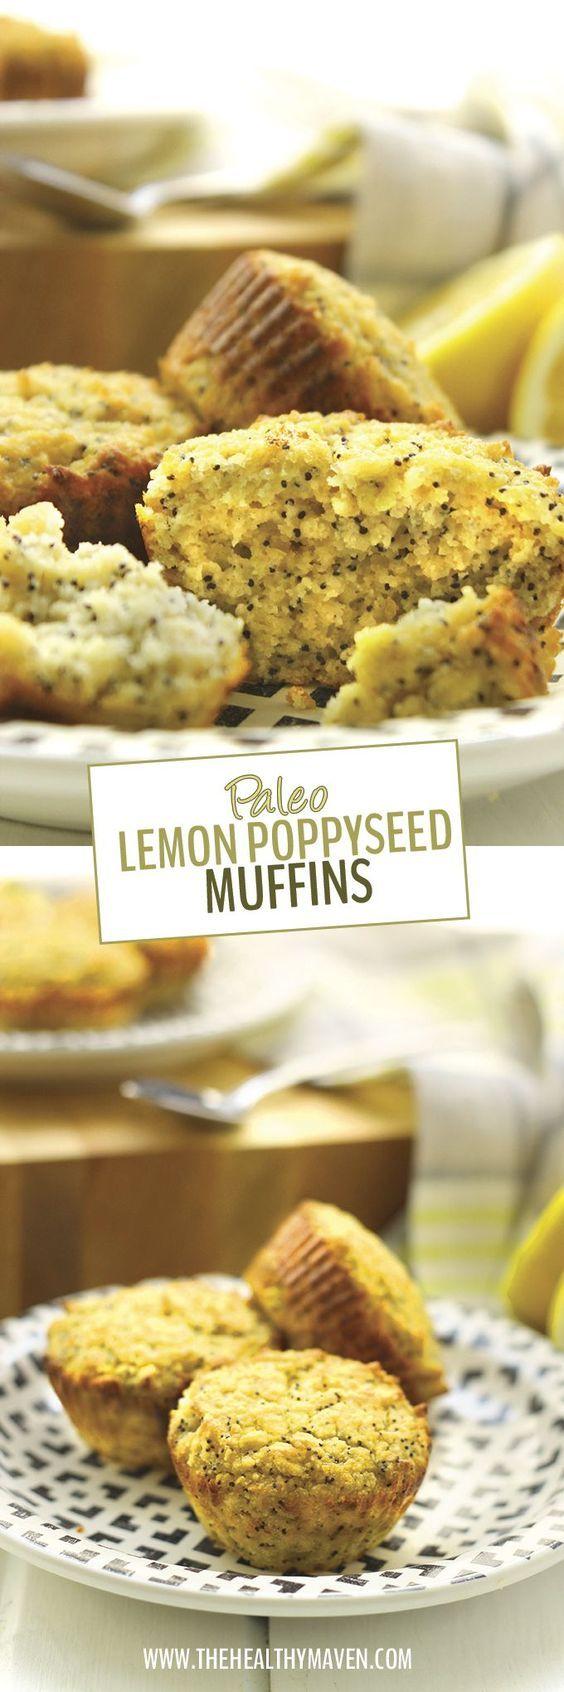 lemon poppyseed muffins - vegan, gluten free